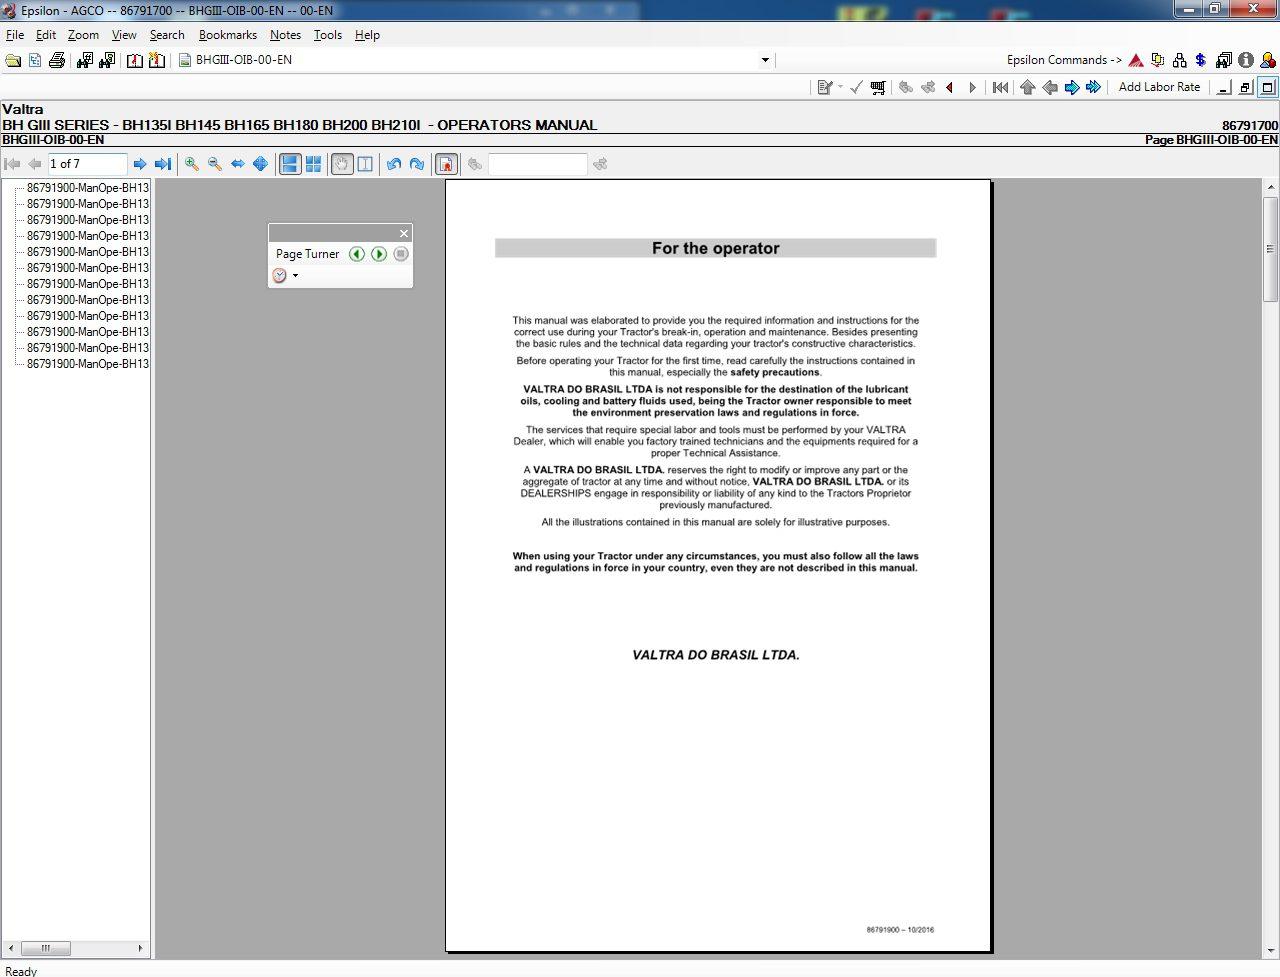 Valtra_SA_AG_South_America_112019_Part_Book_Workshop_Service_Manuals_6